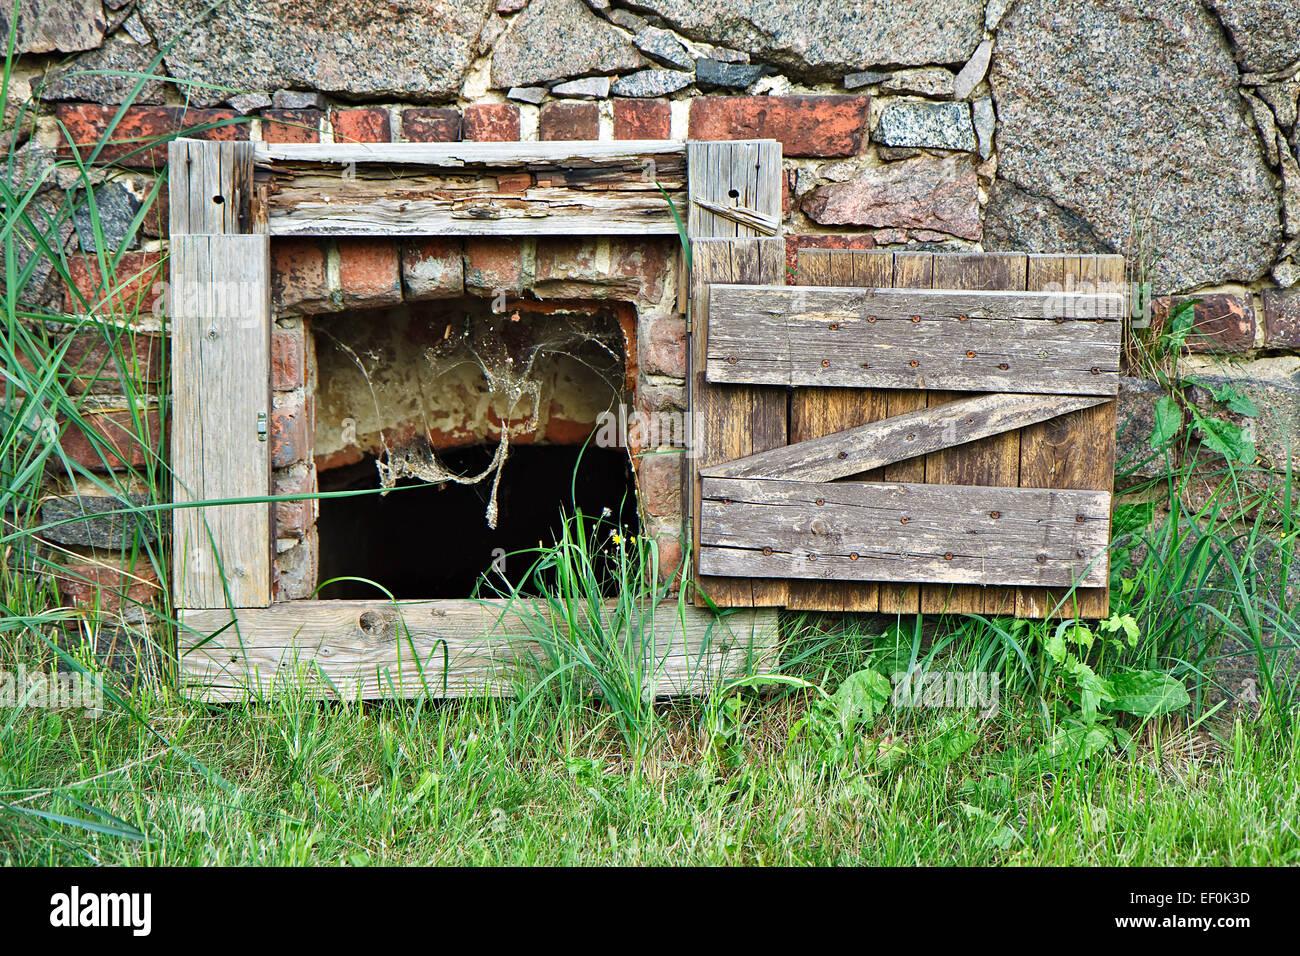 An old basement windows. - Stock Image